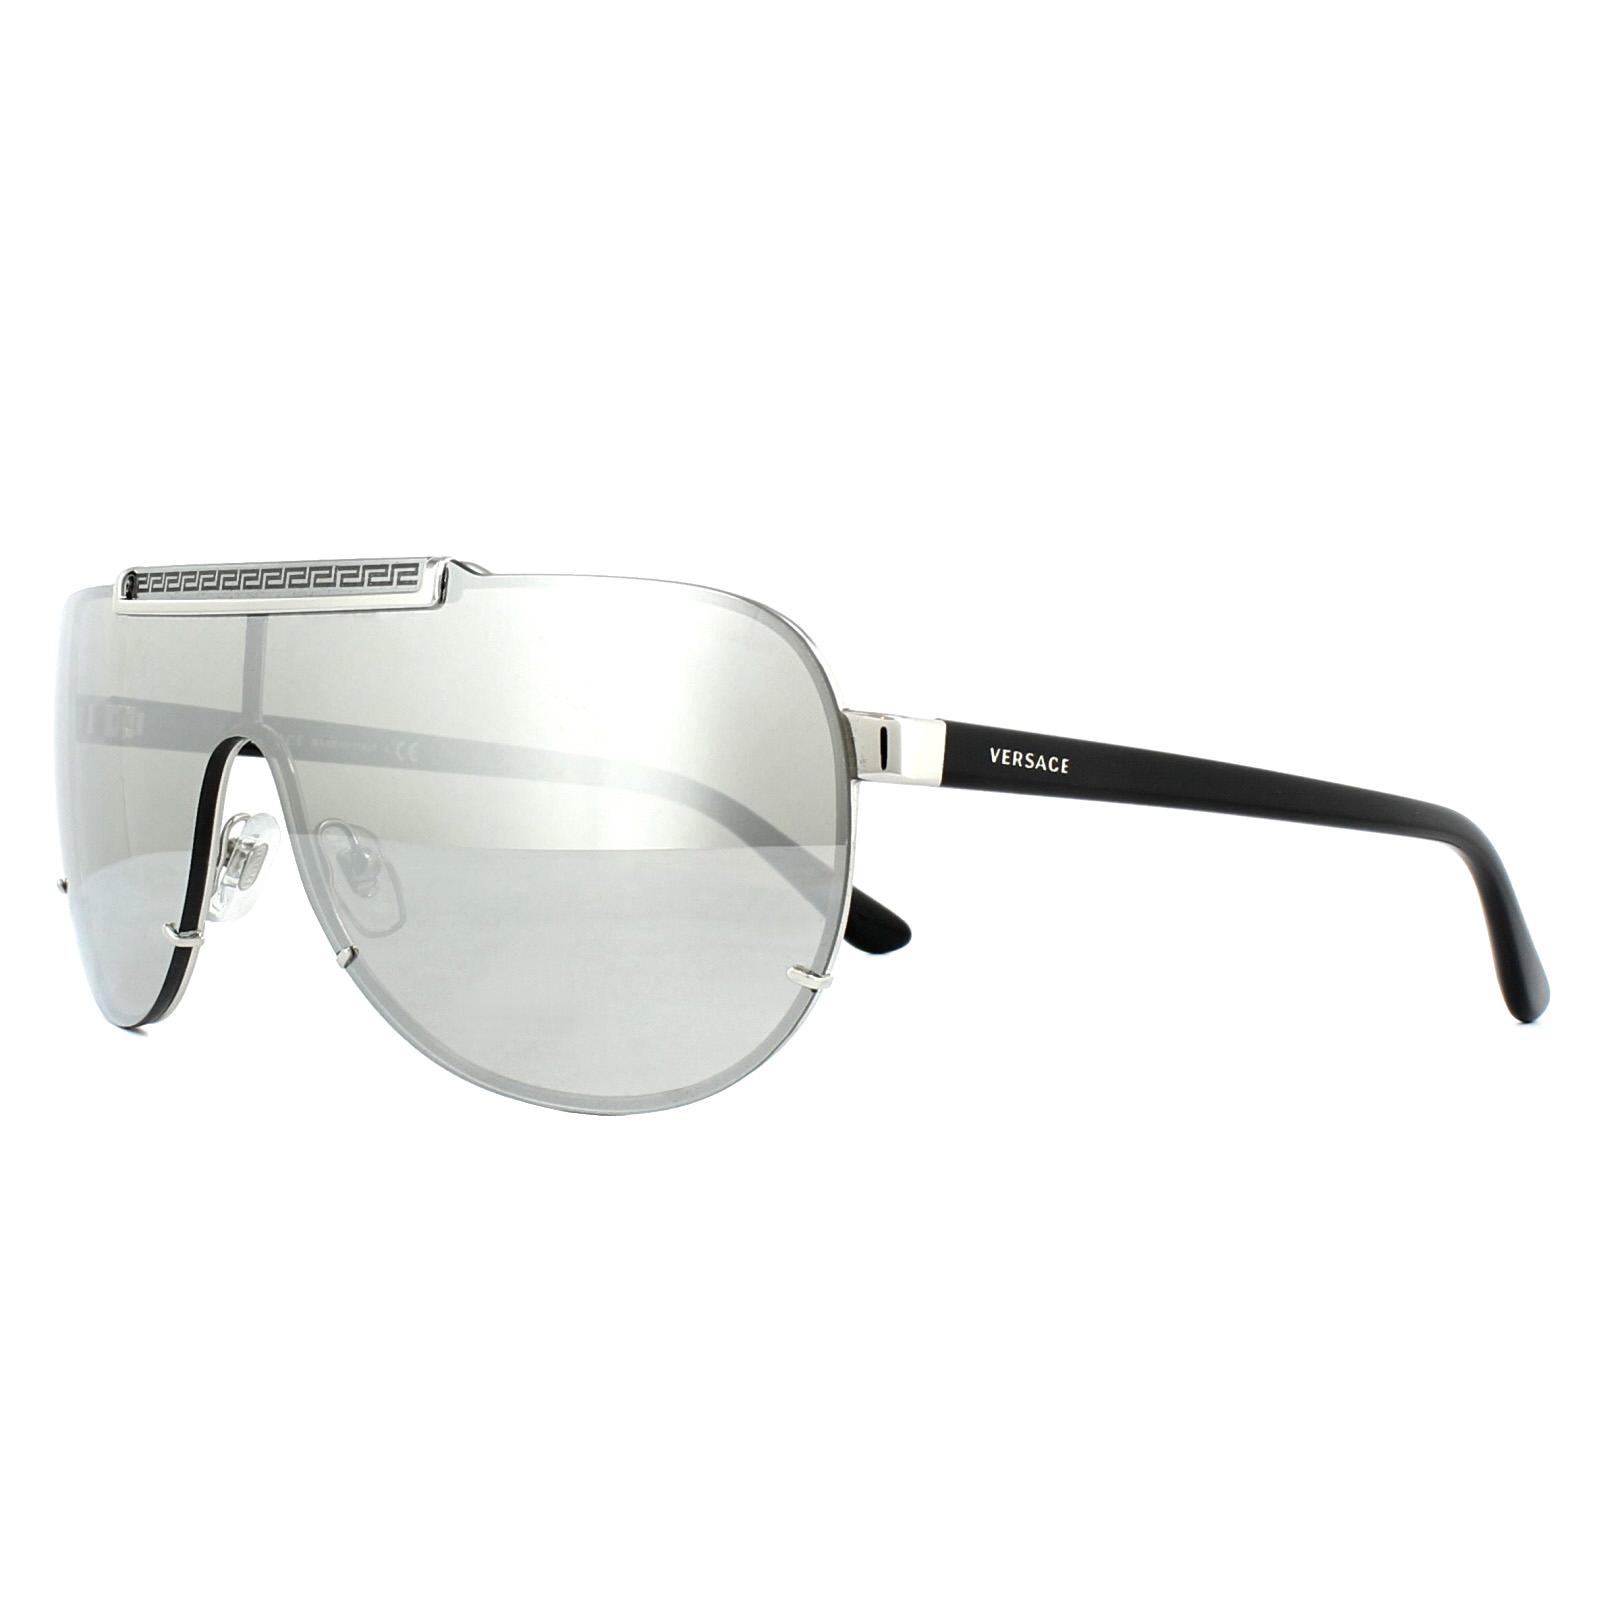 4cdaf7e5848 Details about Versace Sunglasses VE2140 10006G Silver Light Grey Silver  Mirror